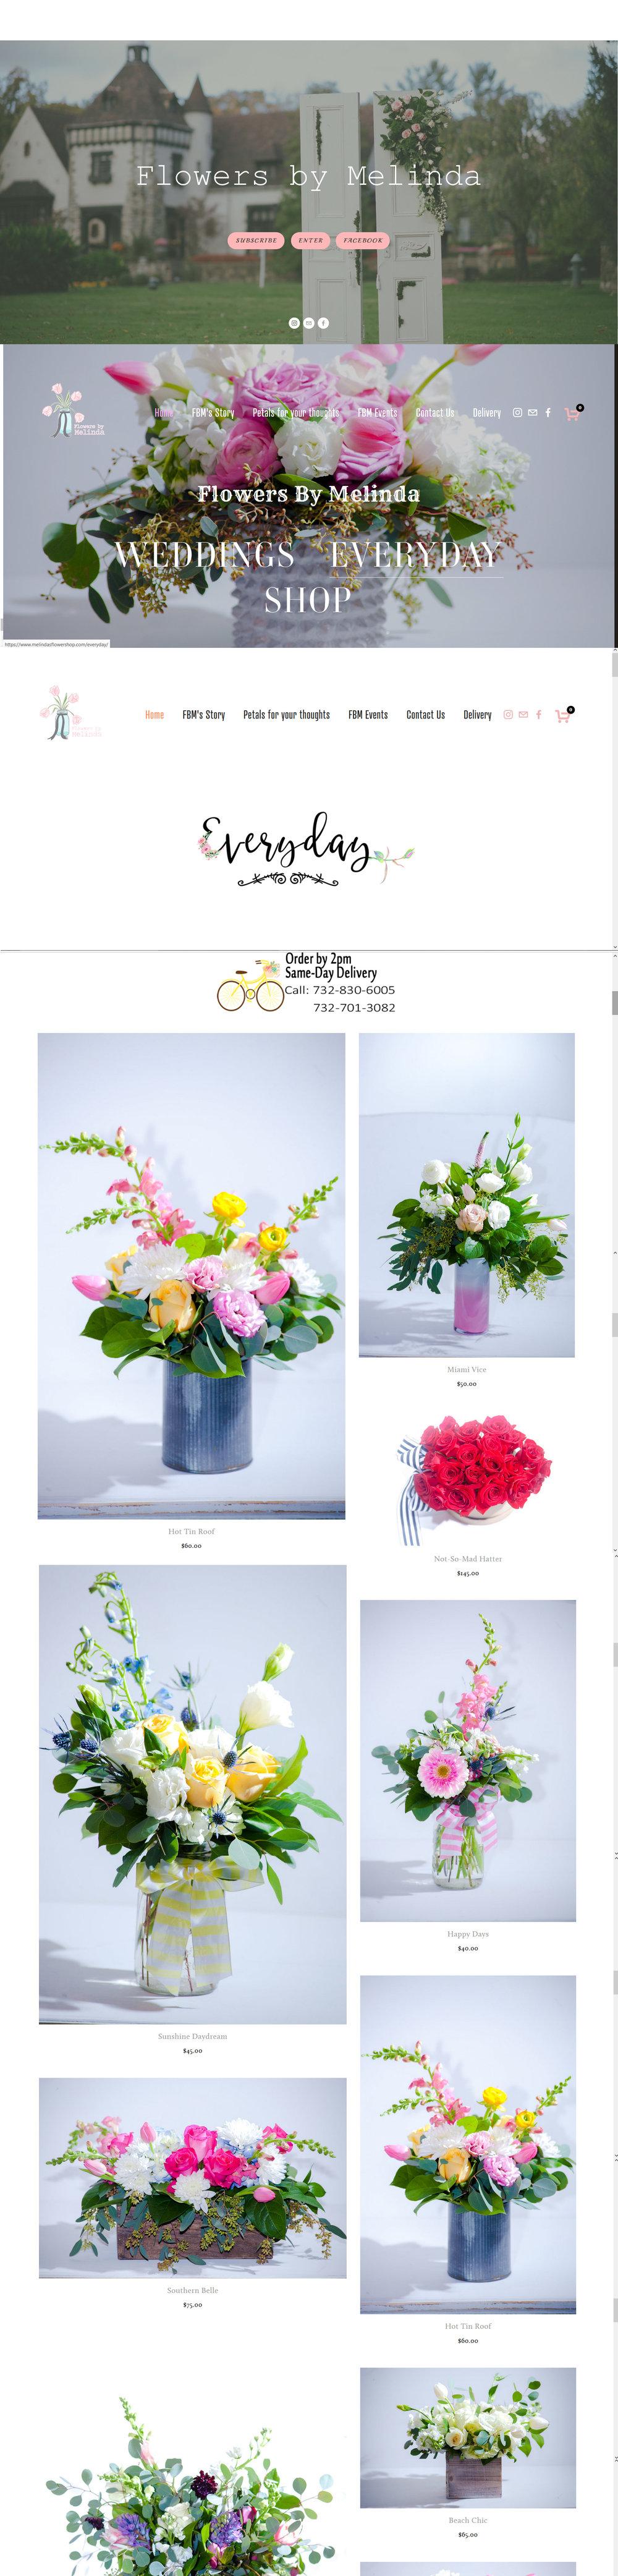 flowers by melinda portfolio.jpg